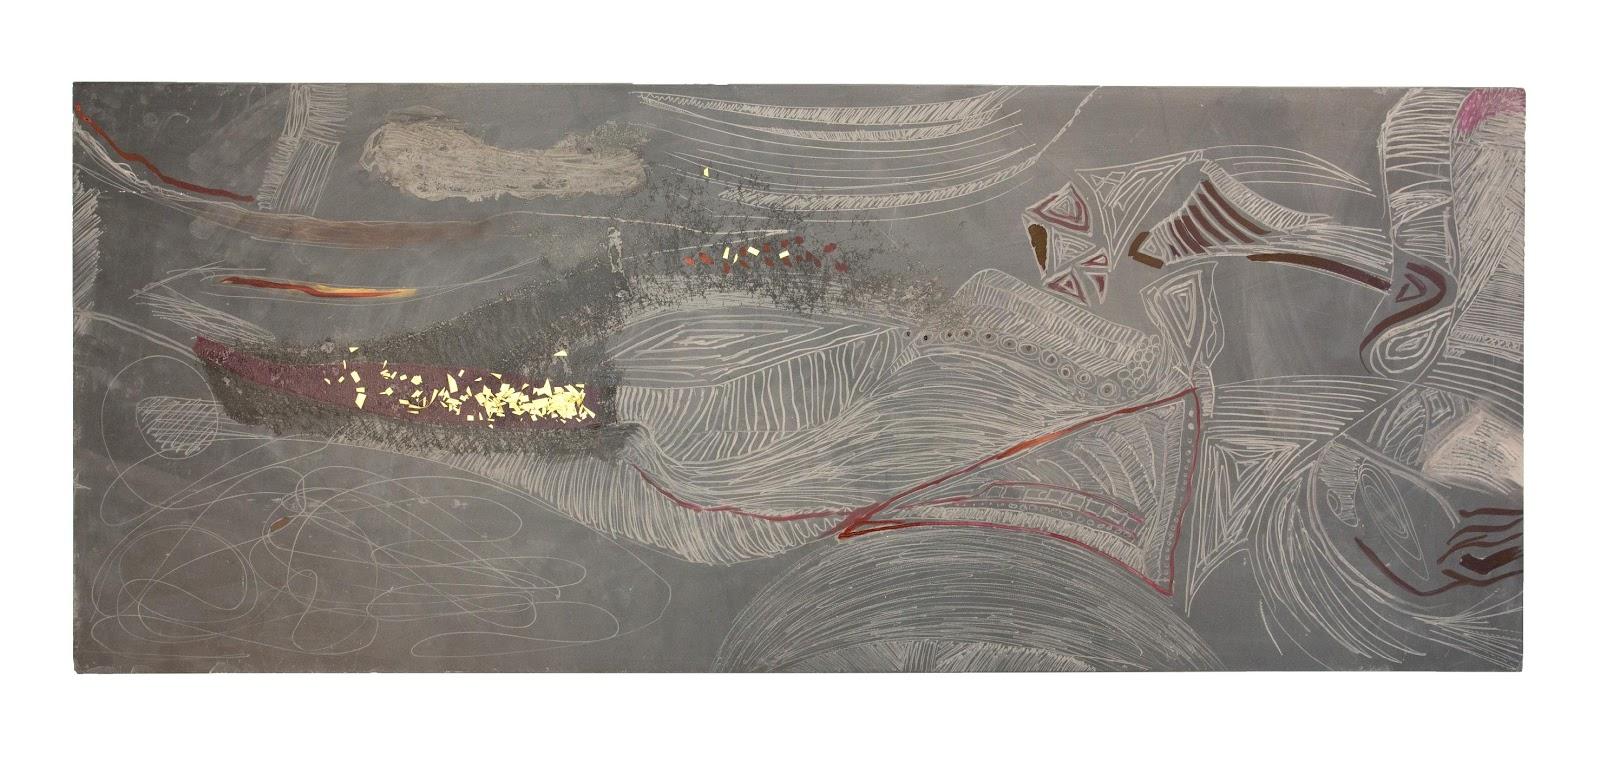 "Map #1 , Brass, ink, and rubbing glaze on black slate, 50 x 24 x 1"", 2015"